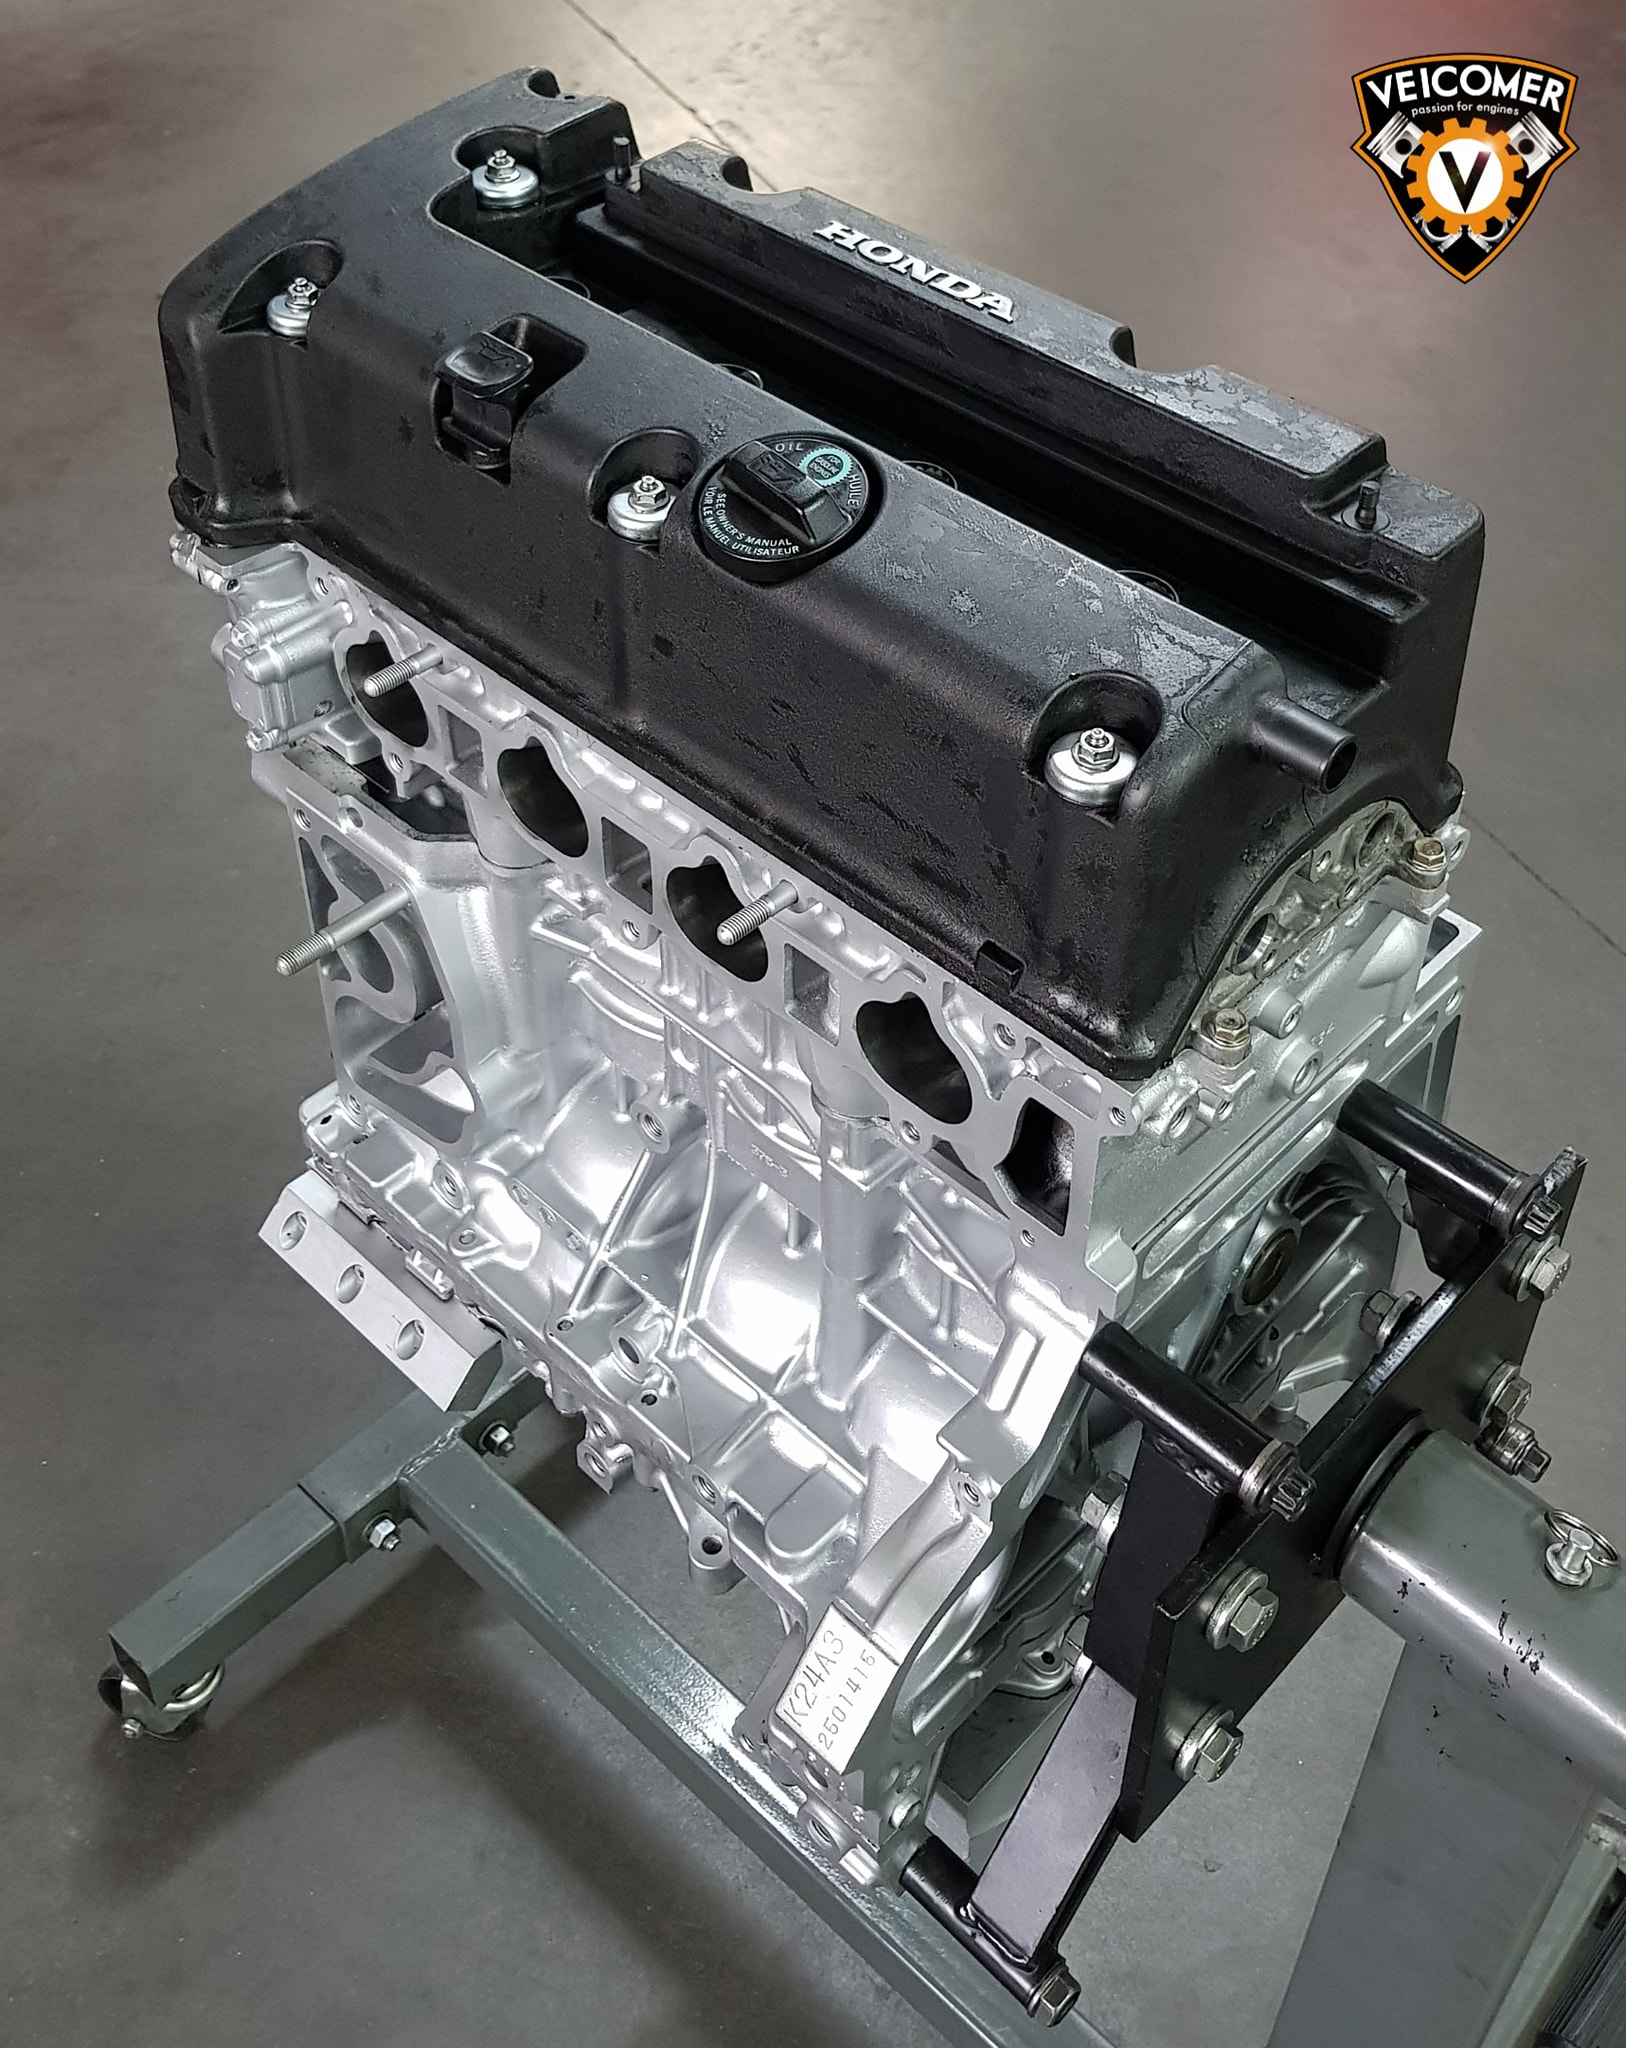 Civic EG6 with a 2 7 L K24 – Engine Swap Depot